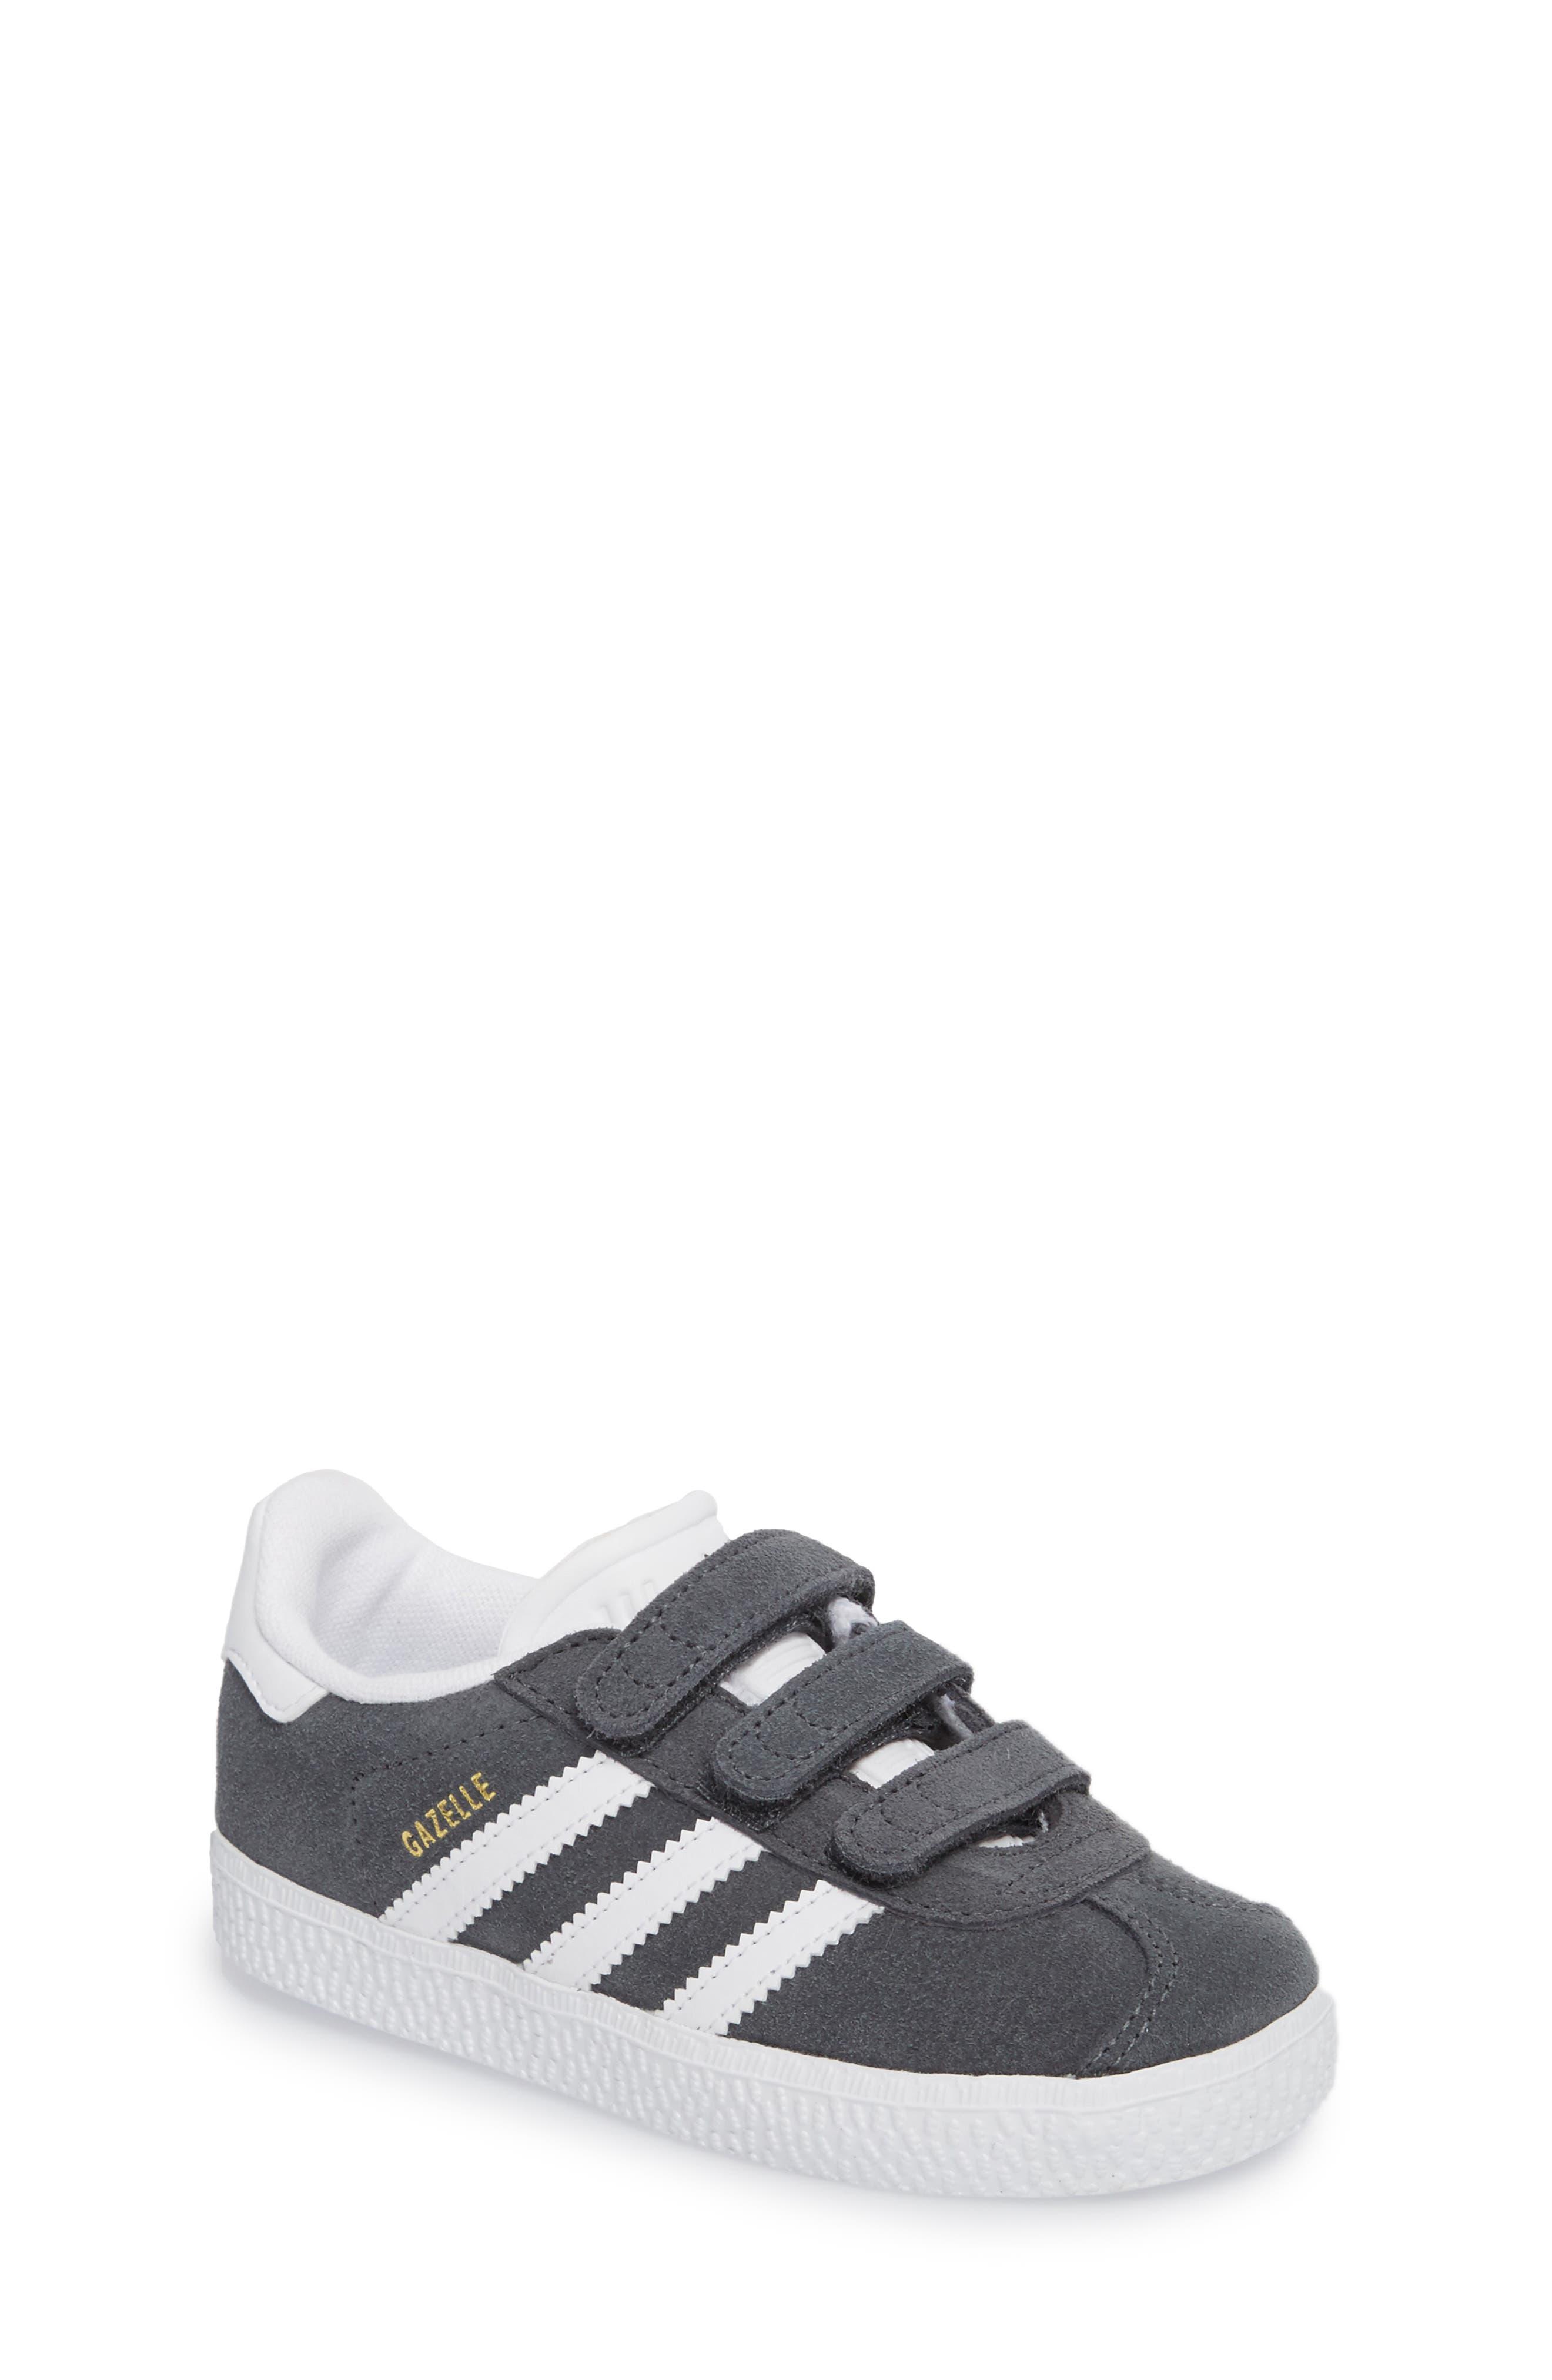 Gazelle Sneaker,                             Main thumbnail 1, color,                             SOLID GREY / WHITE / WHITE